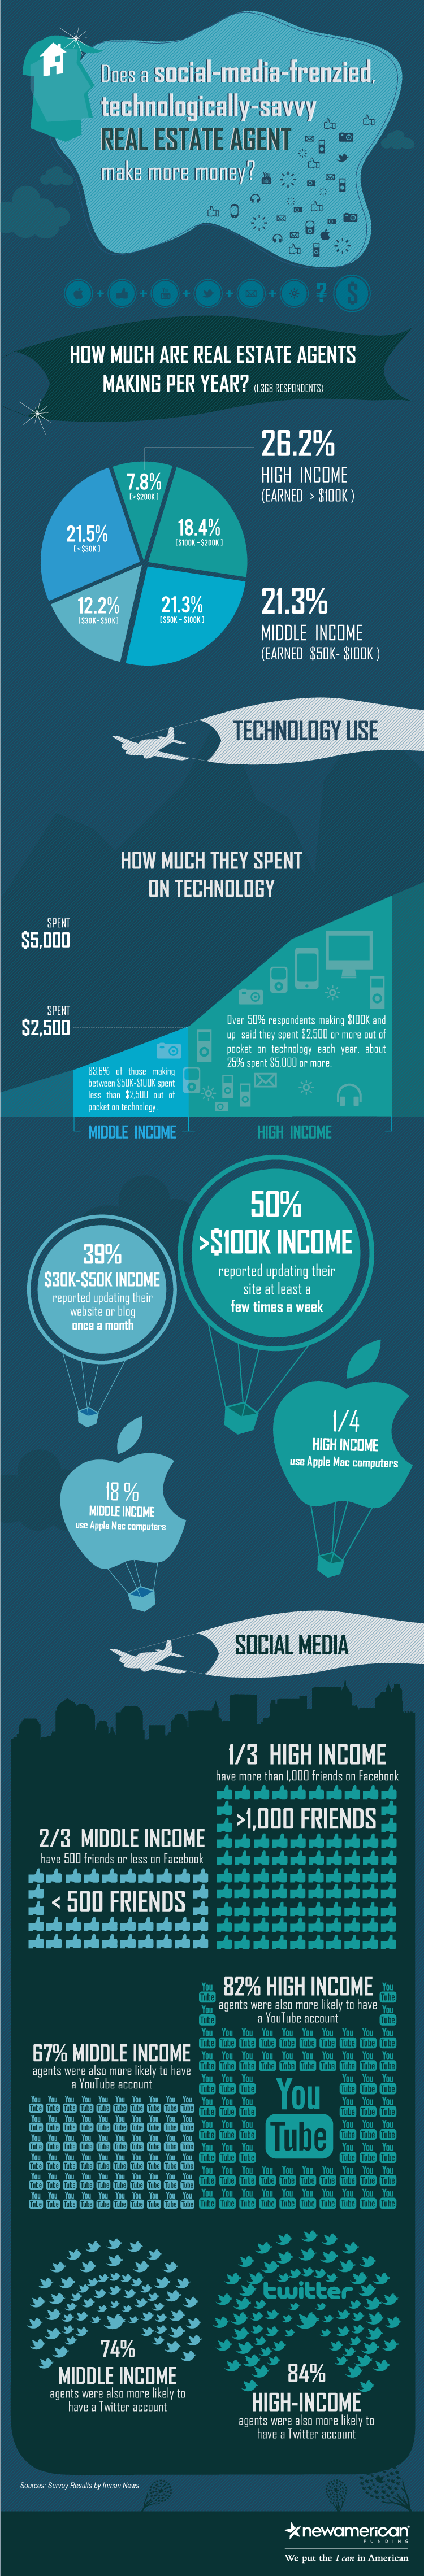 9 Incredible Real Estate Social Media Marketing Statistics